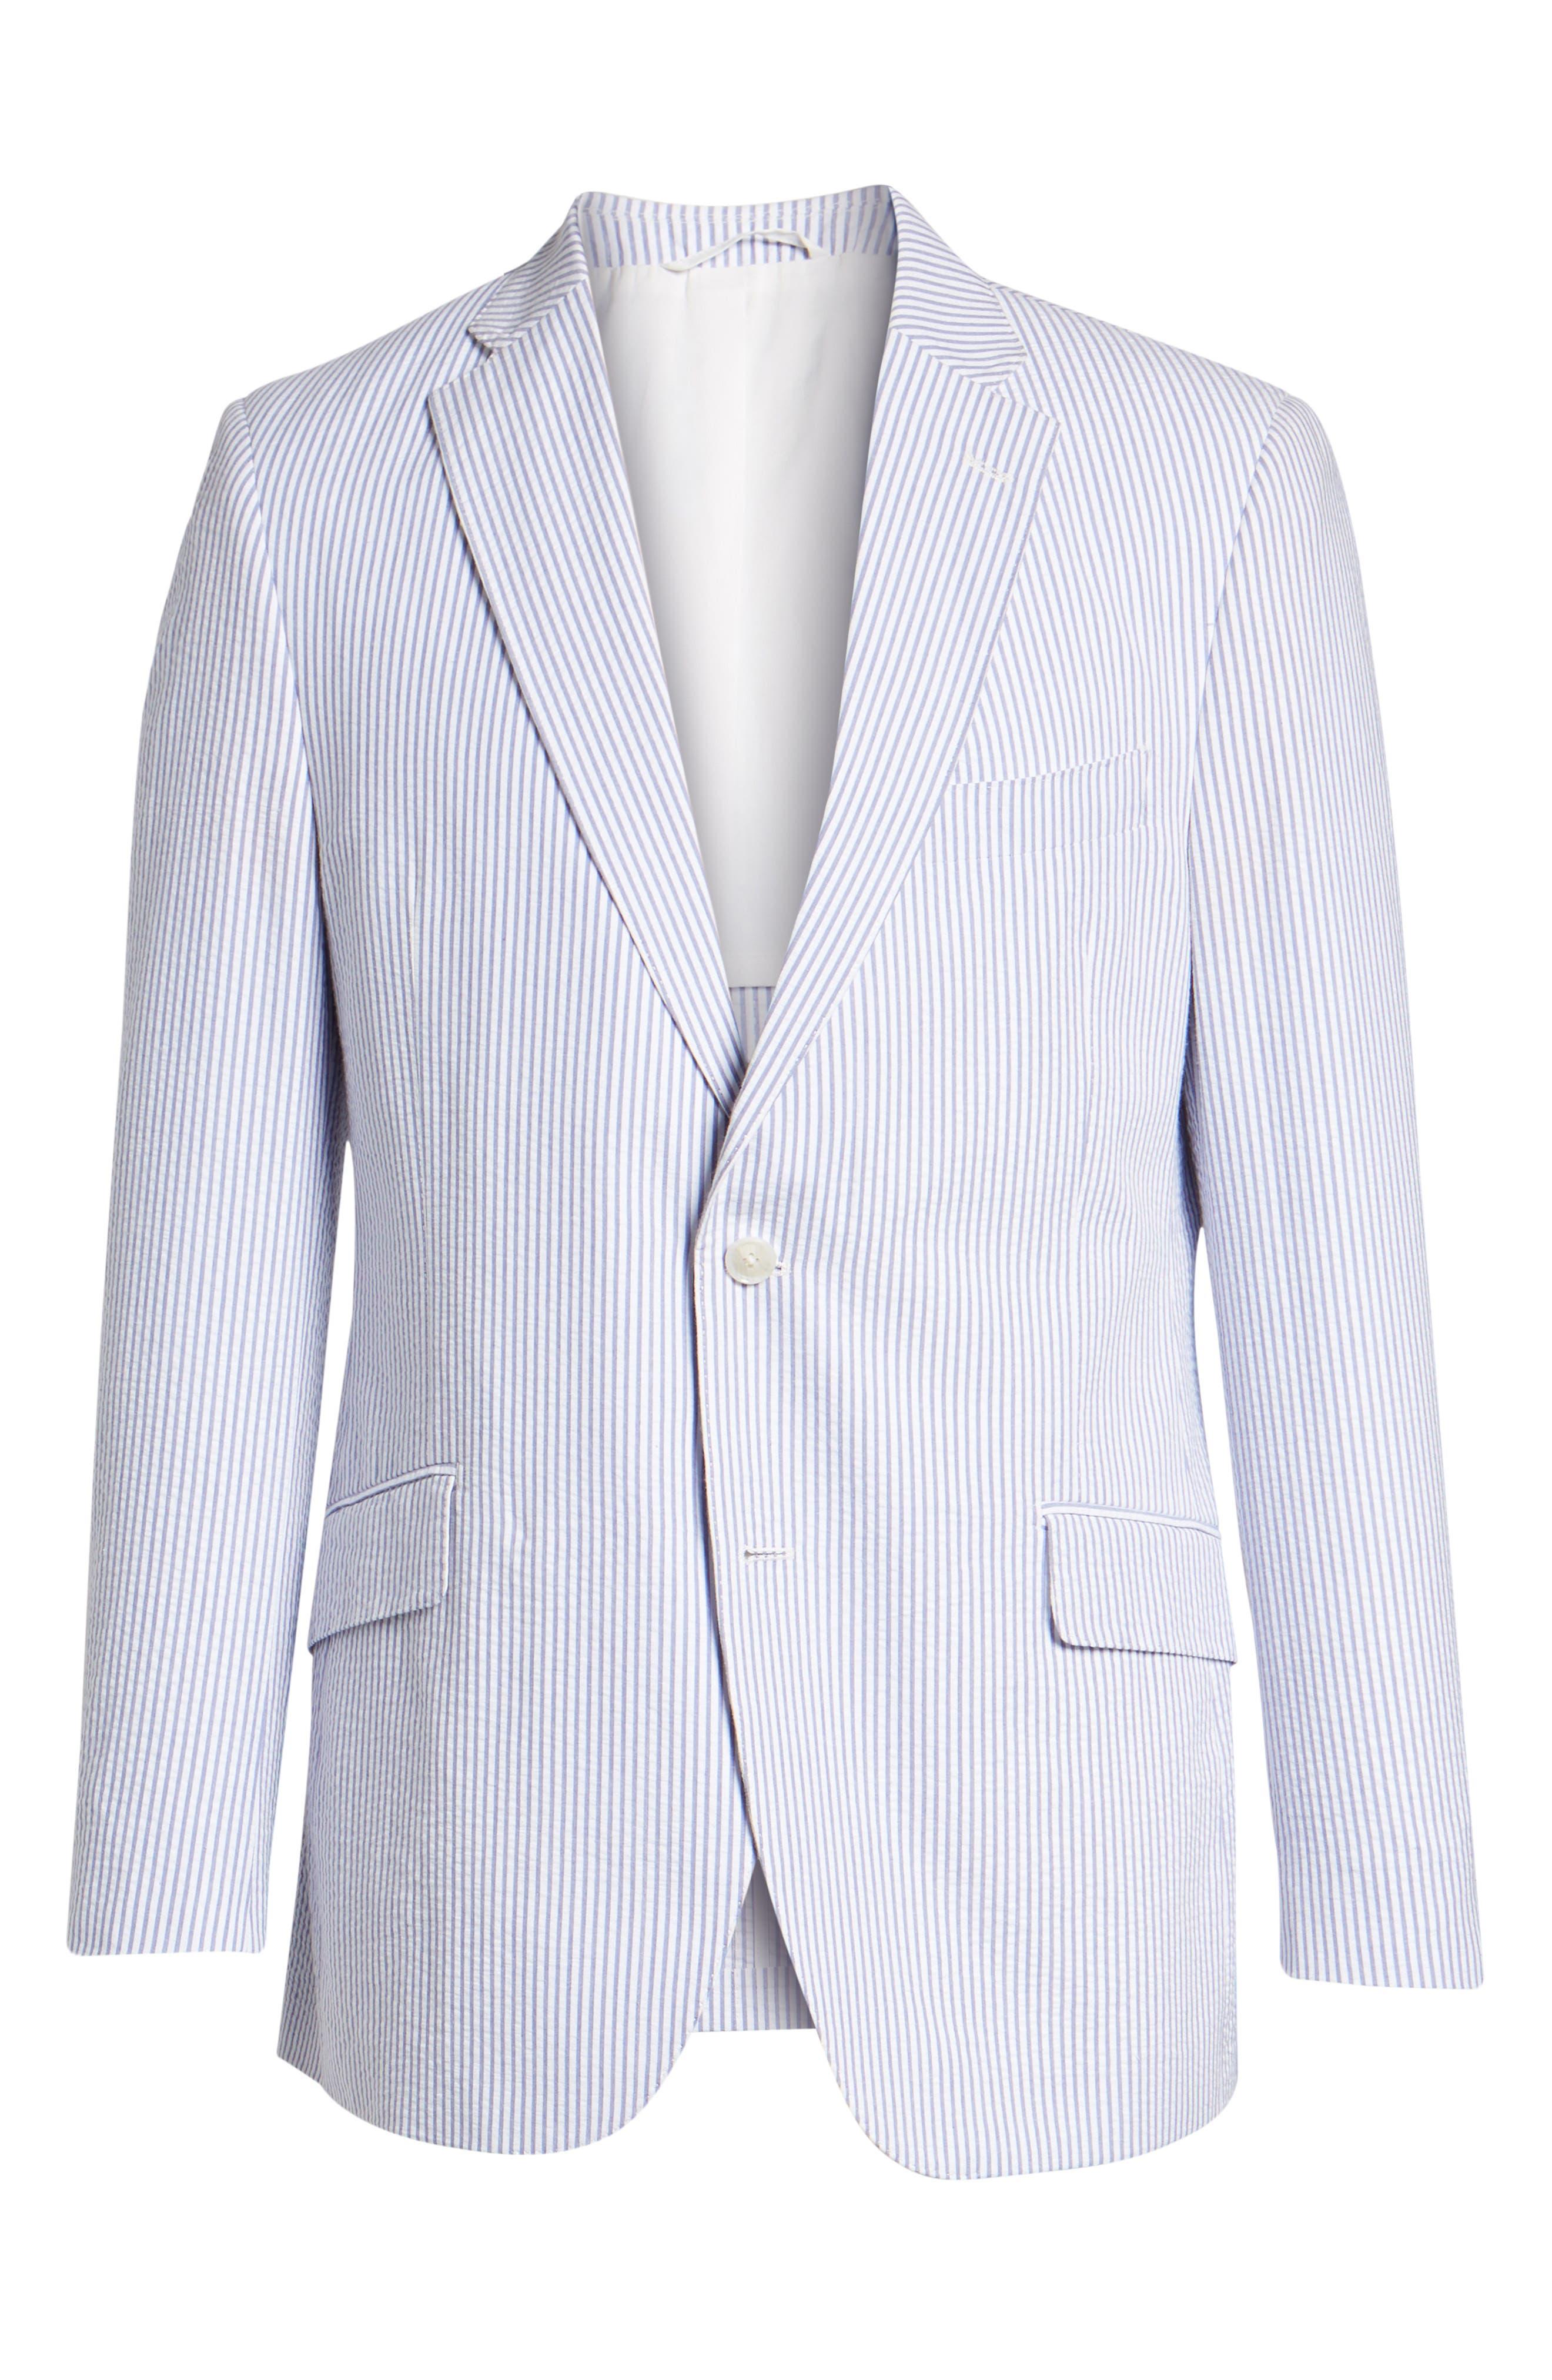 Jack AIM Classic Fit Seersucker Sport Coat,                             Alternate thumbnail 6, color,                             Blue And White